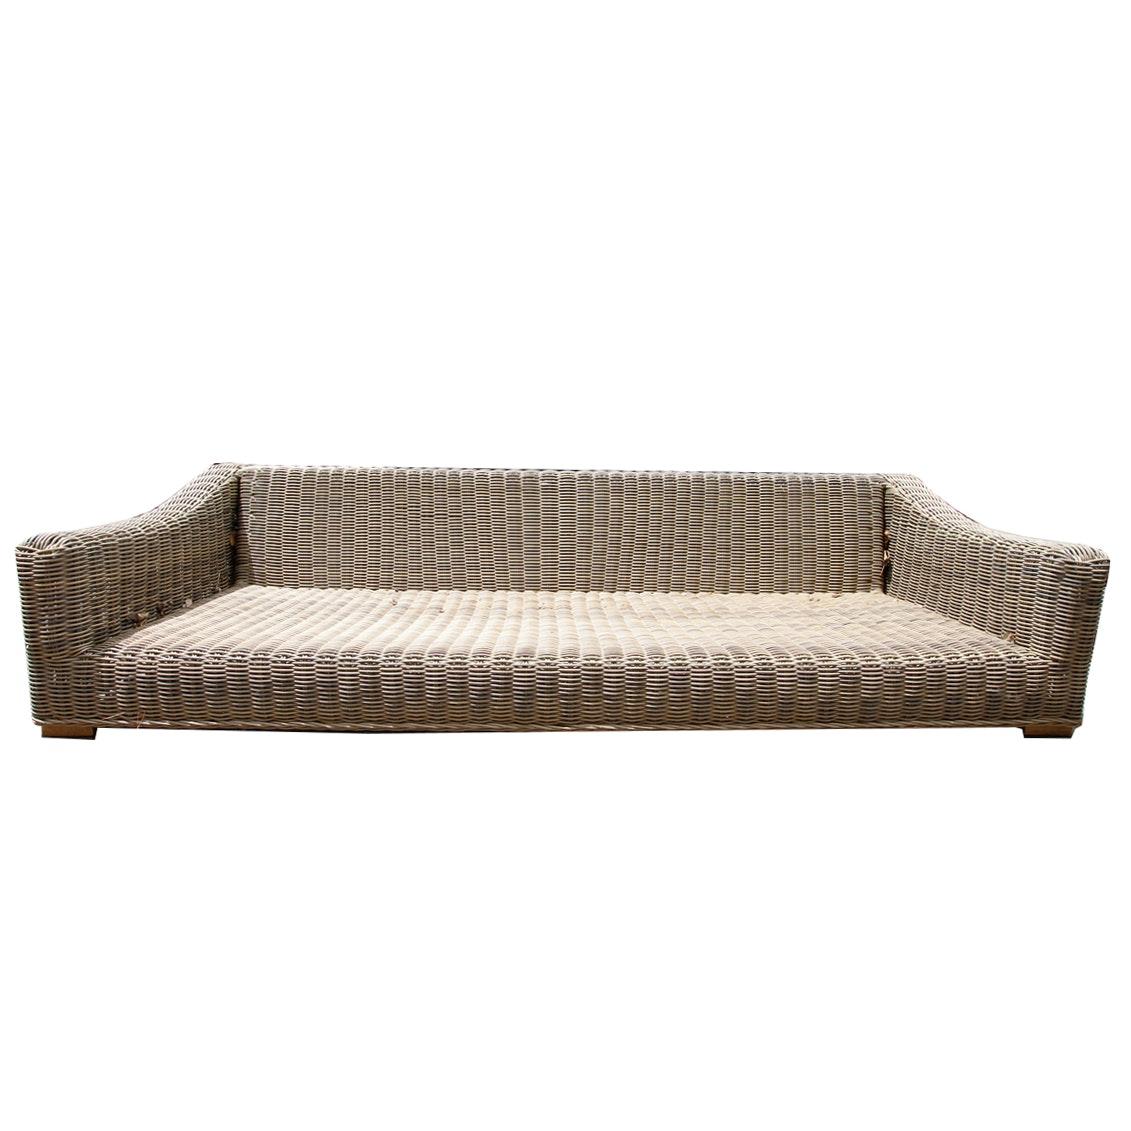 Restoration Hardware Wicker Outdoor Sofa